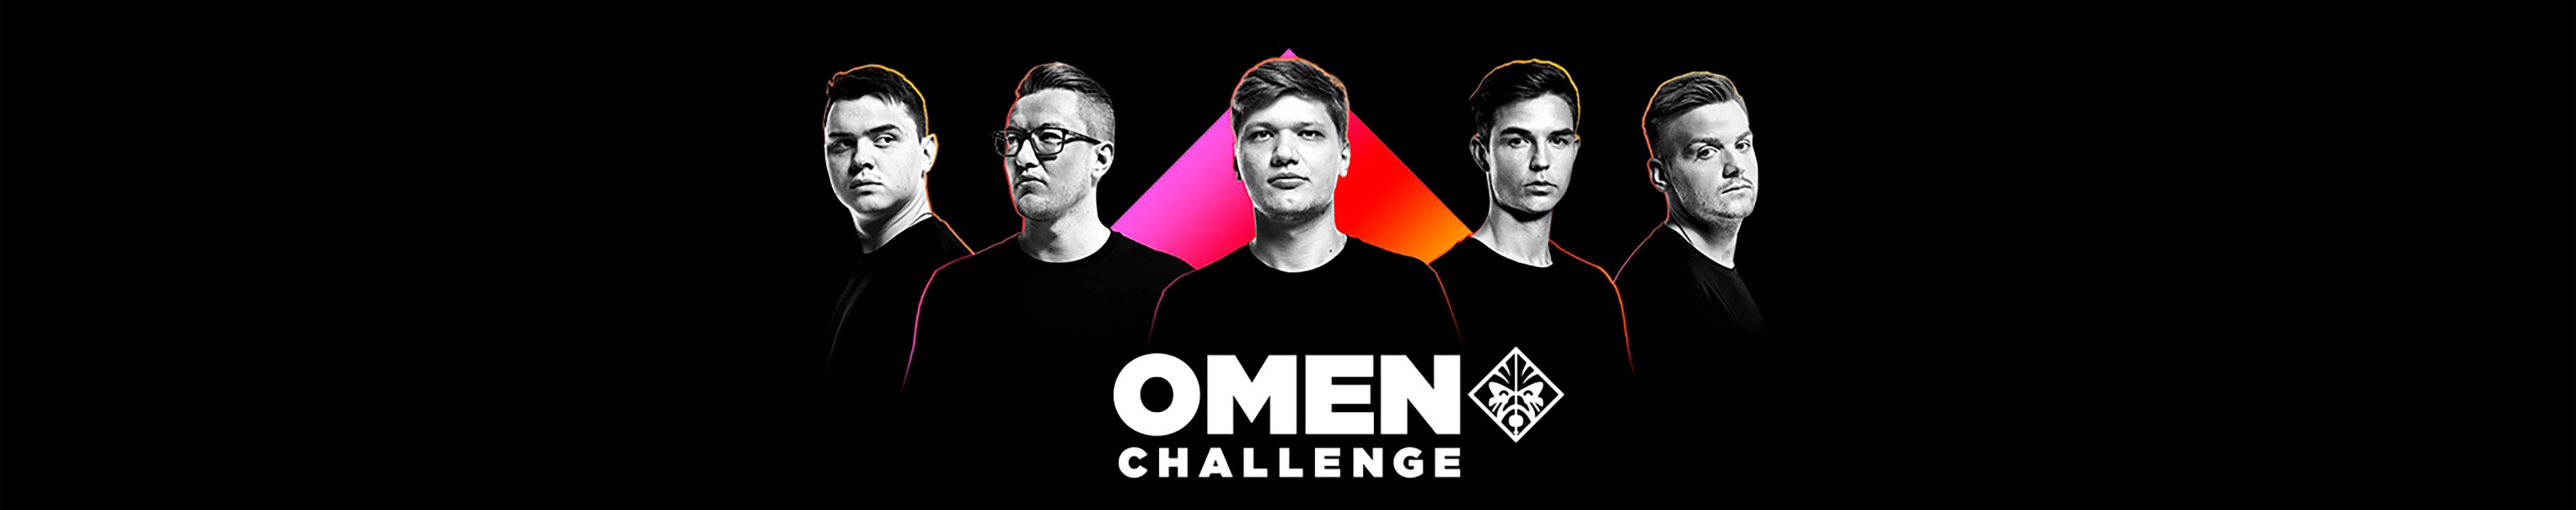 OMEN Challenge